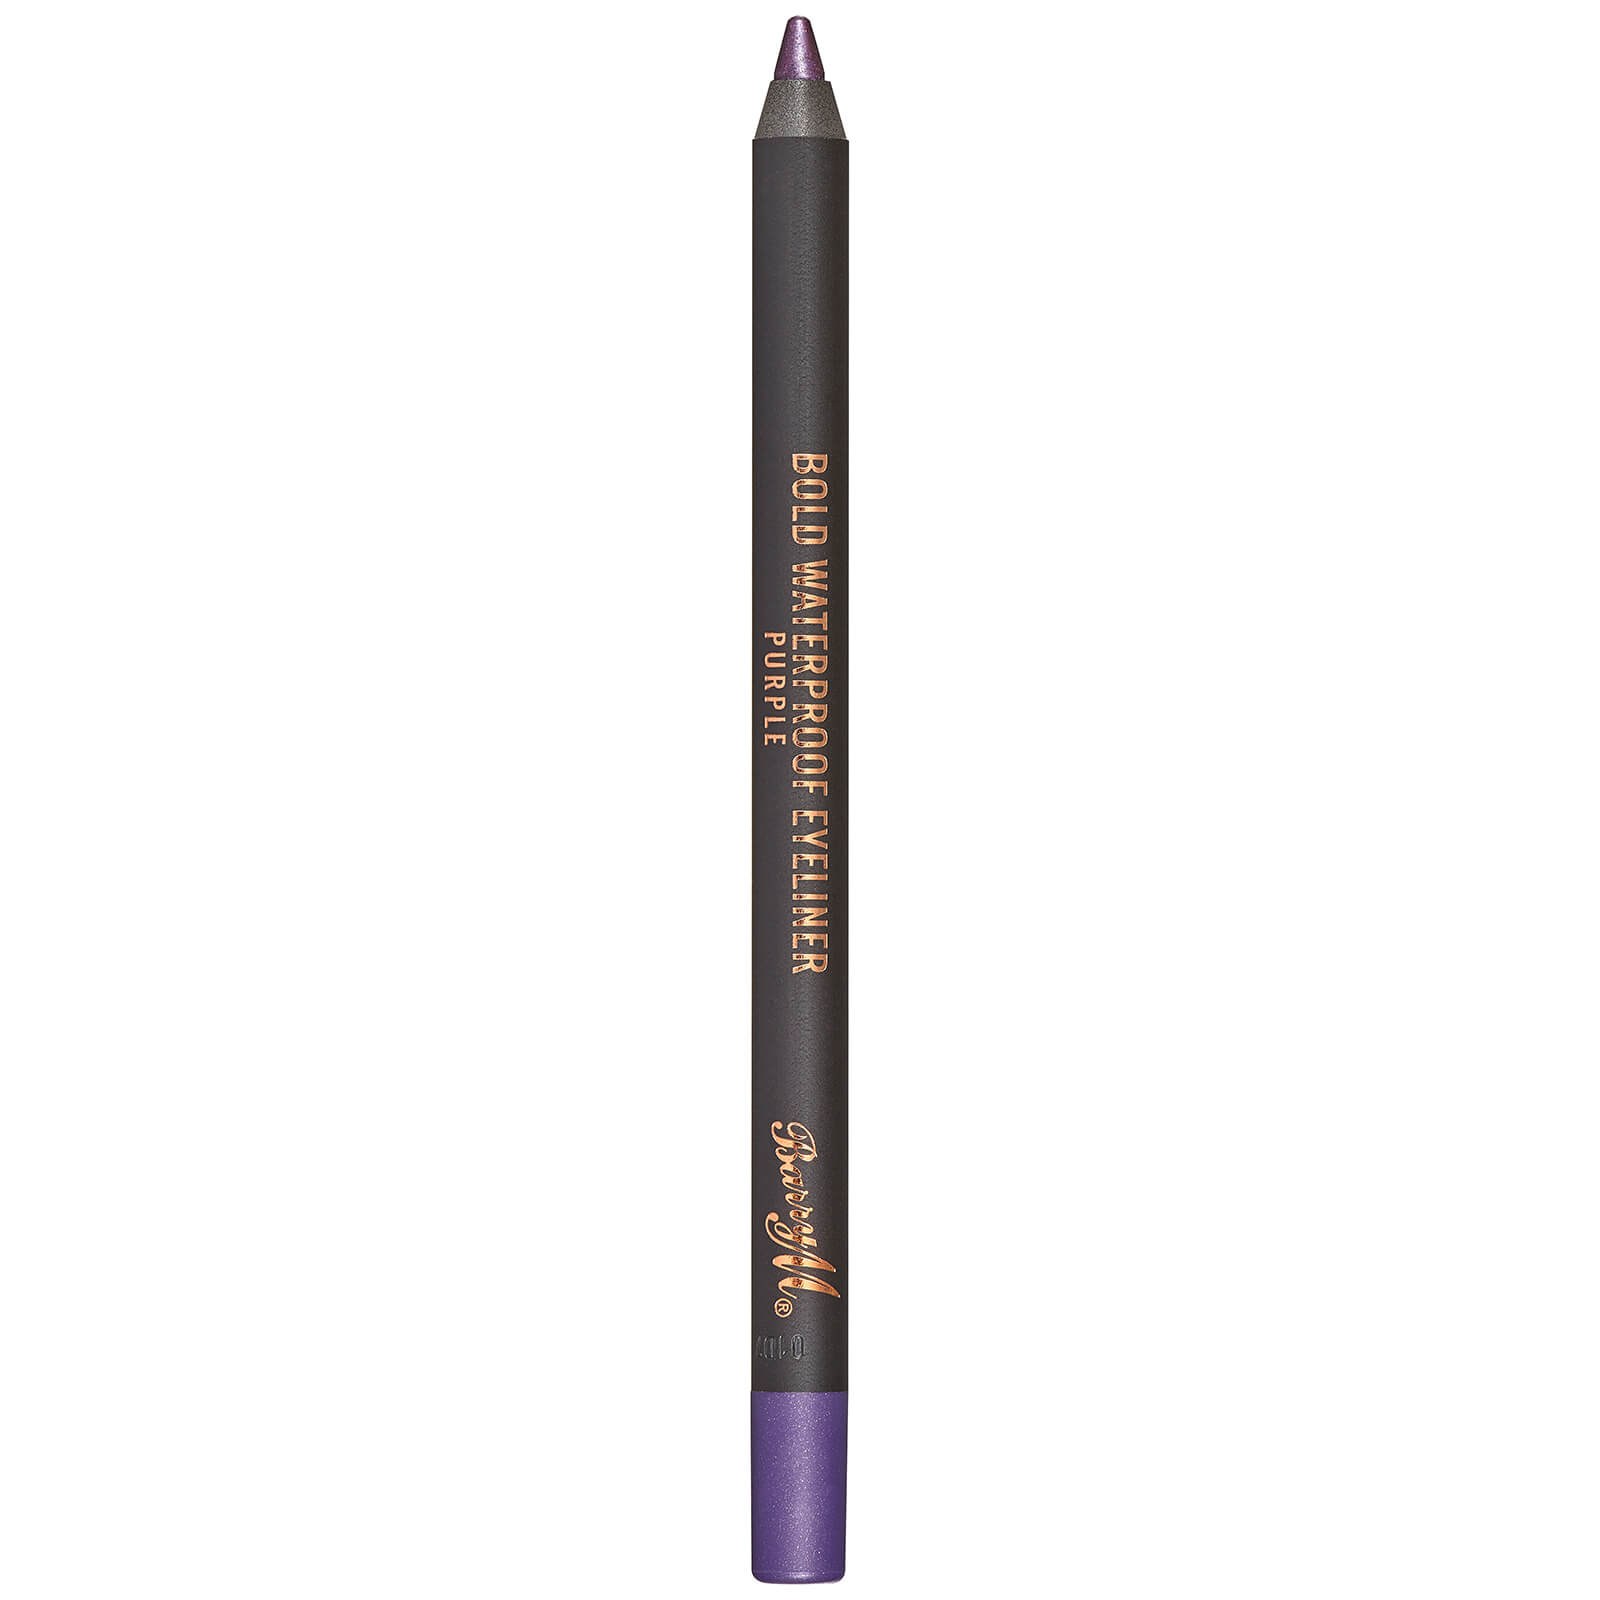 Barry M Cosmetics Bold Waterproof Eyeliner (Various Shades) - Purple